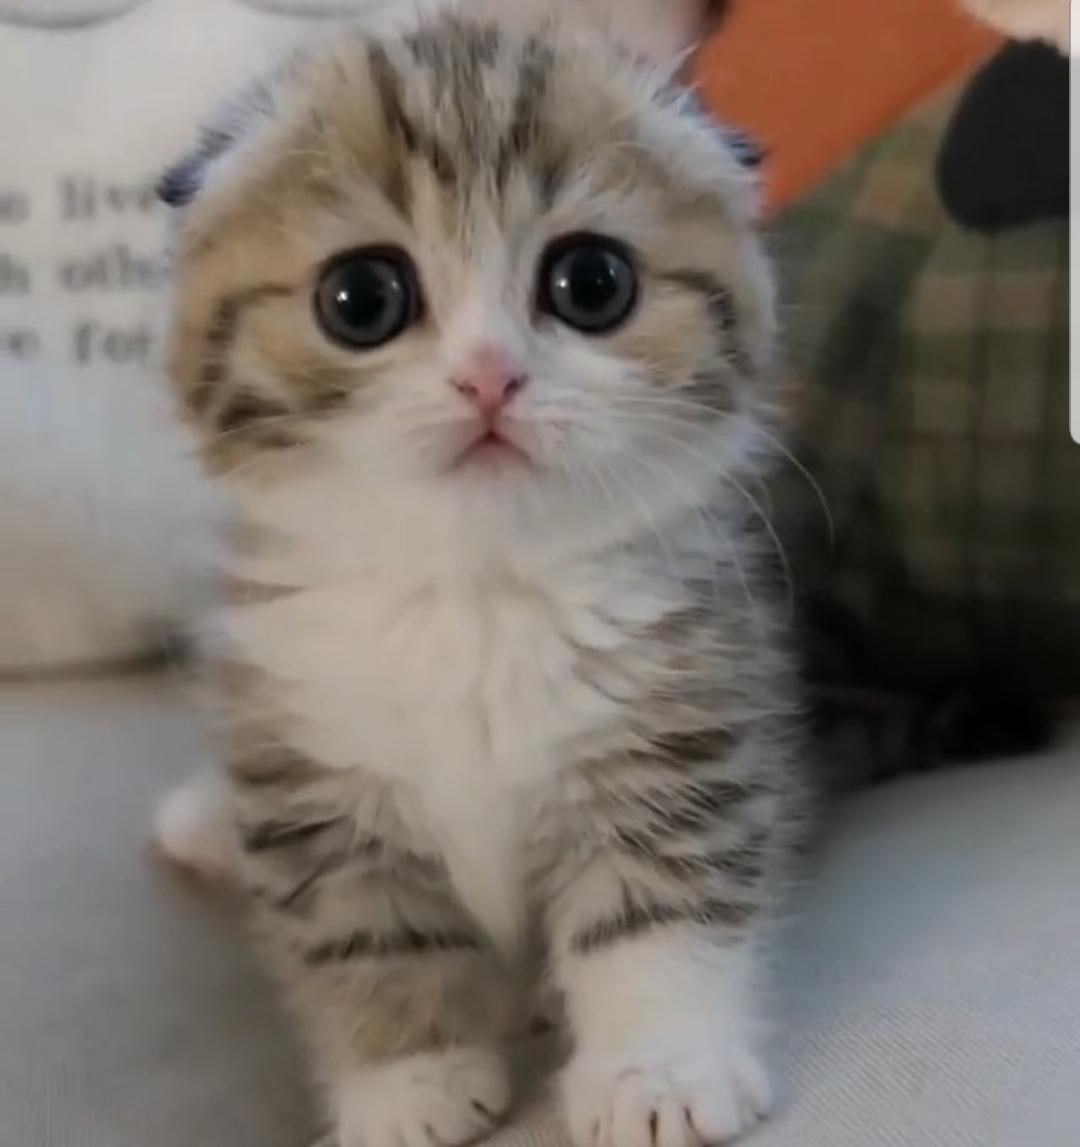 Kitten Mittenshttps I Redd It 0j3g54bhsyu11 Jpg Cute Baby Cats Kittens Cutest Cute Little Kittens